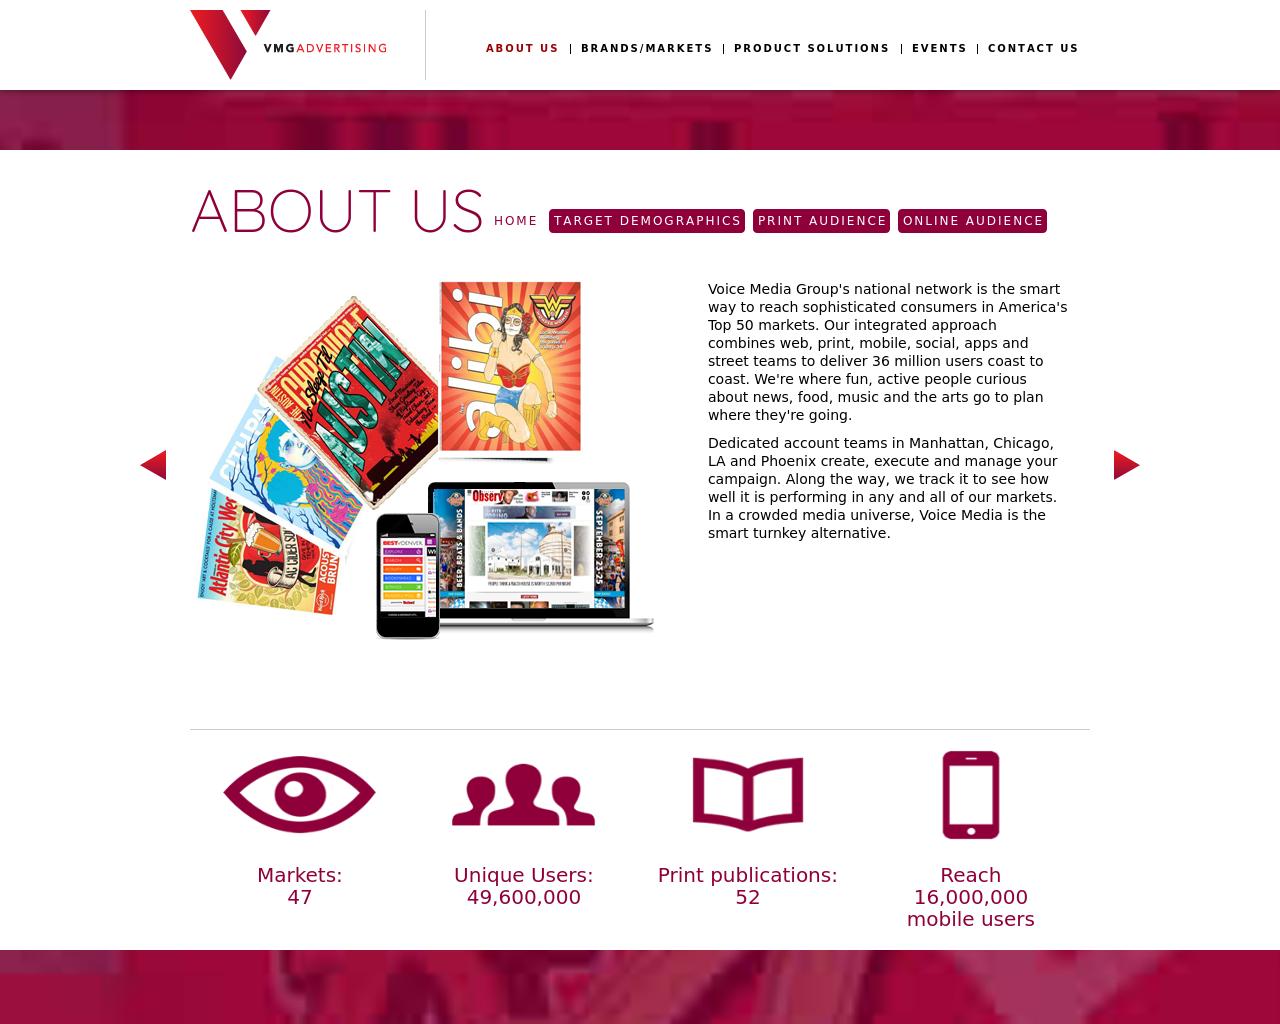 VMG-Advertising-Advertising-Reviews-Pricing